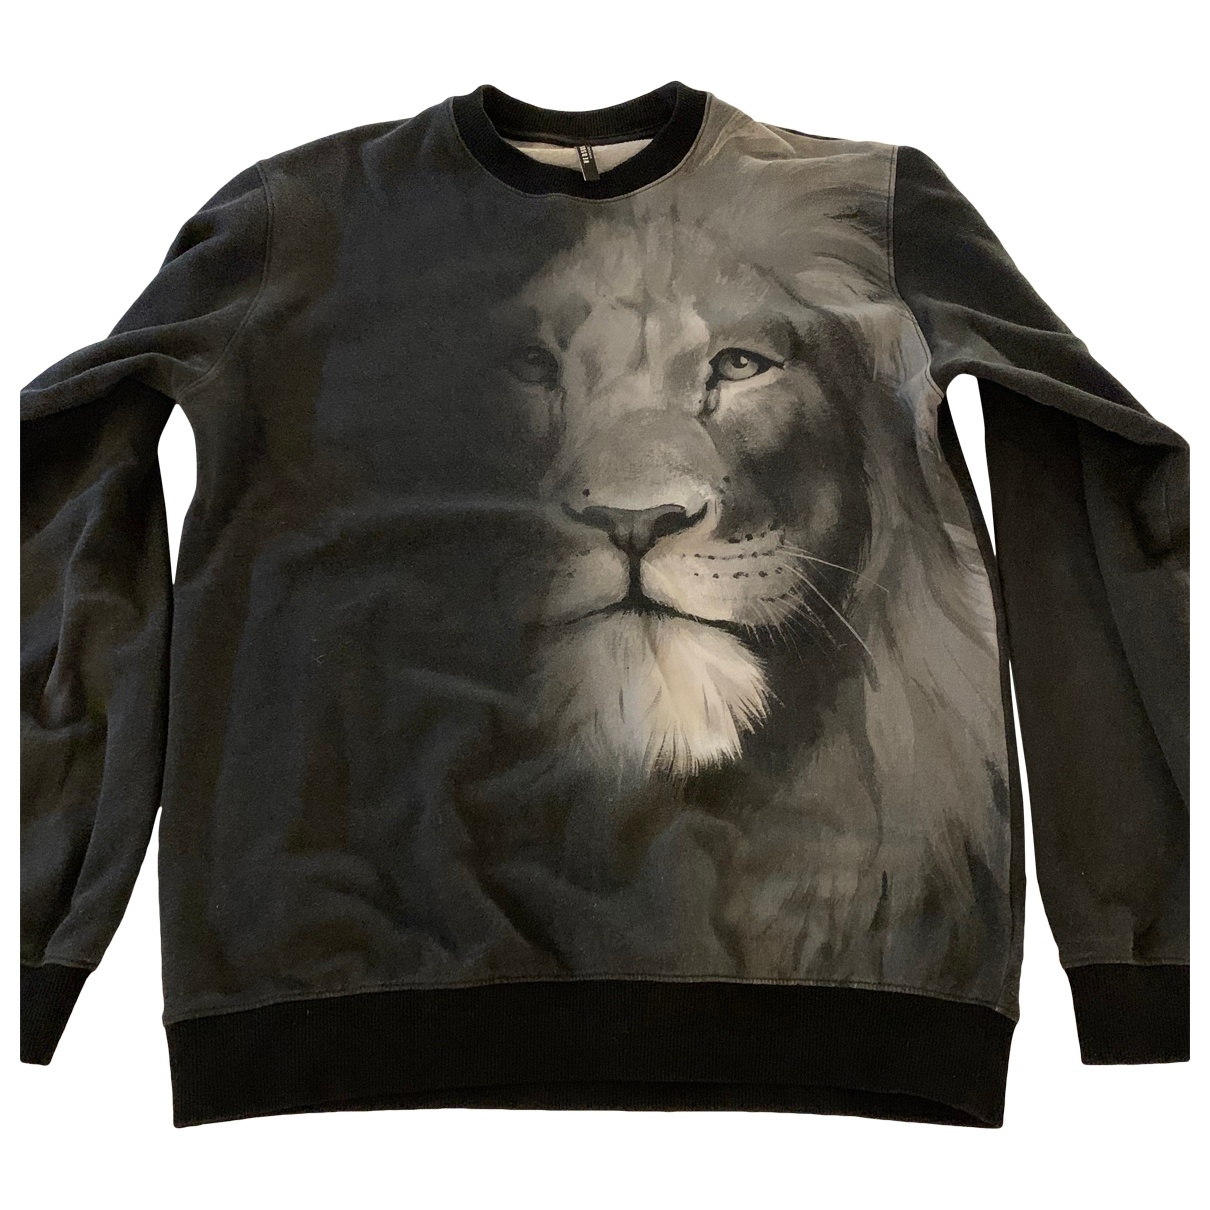 Versus \N Cotton Shirts for Men S International